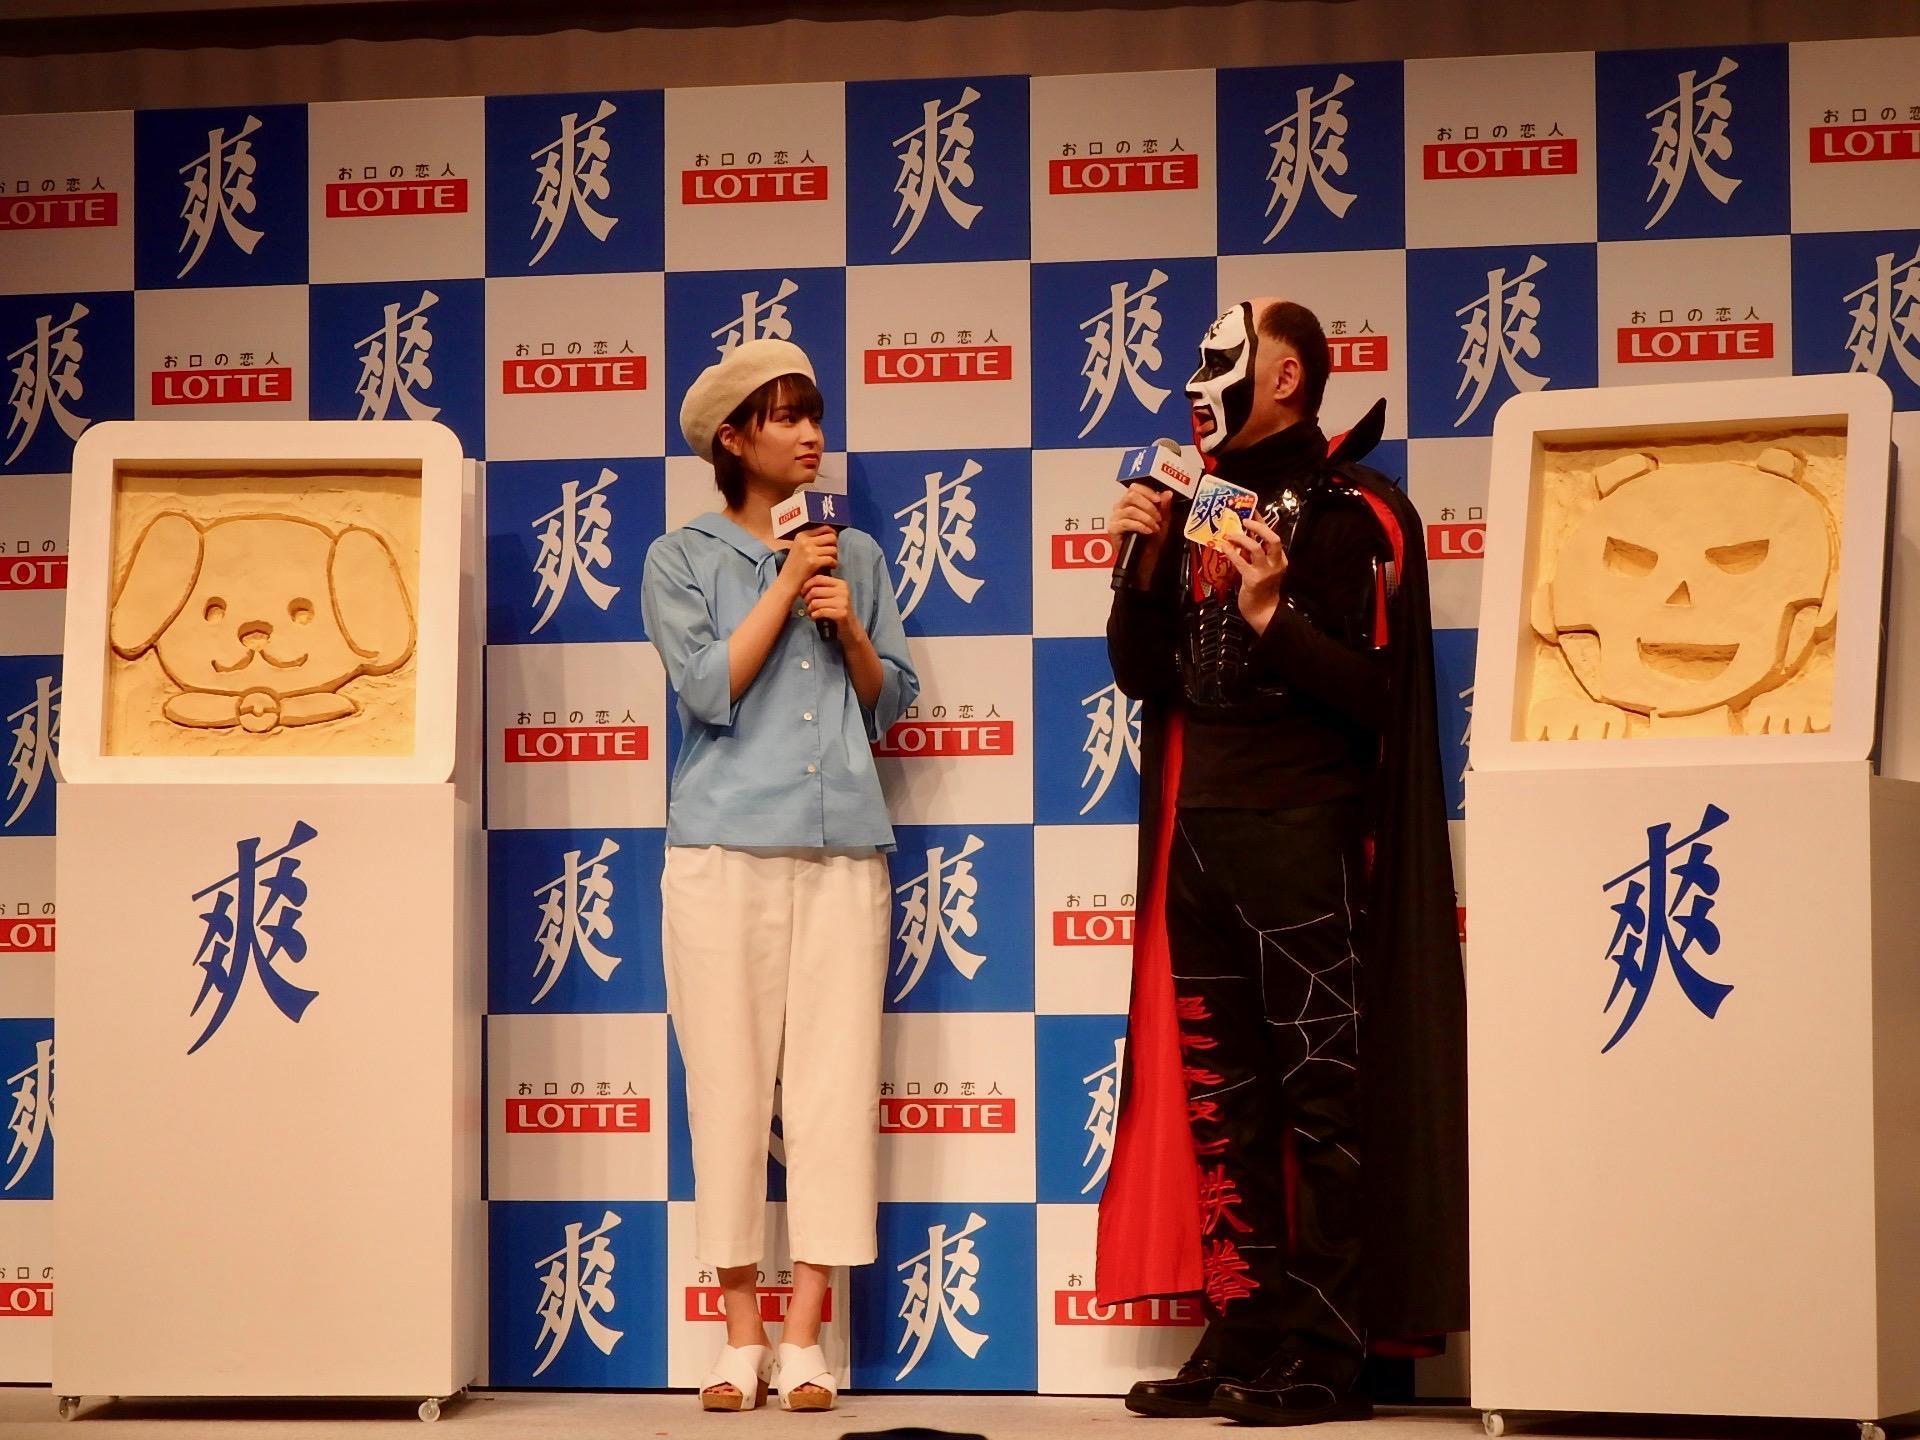 http://news.yoshimoto.co.jp/20180612212637-9455efa0305ec01f0bf2af0187dd4edcf739d24b.jpg